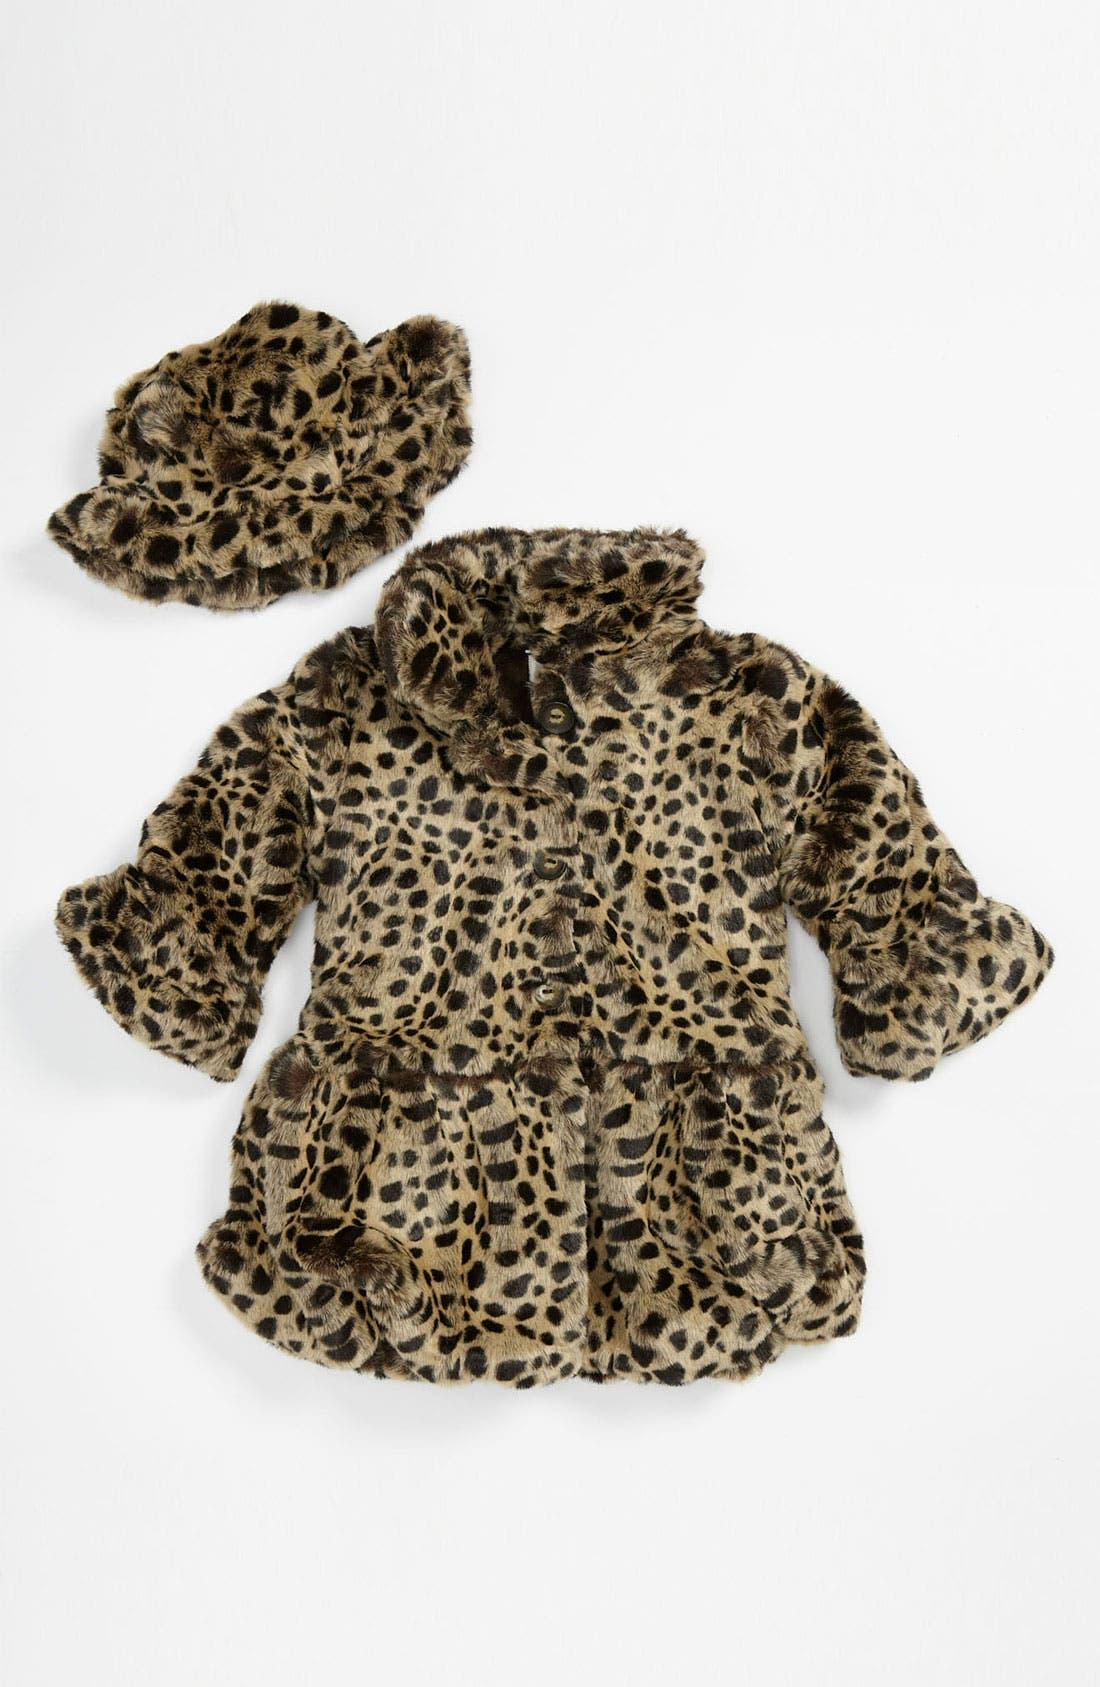 Alternate Image 1 Selected - Widgeon Faux Fur Coat & Hat (Toddler)